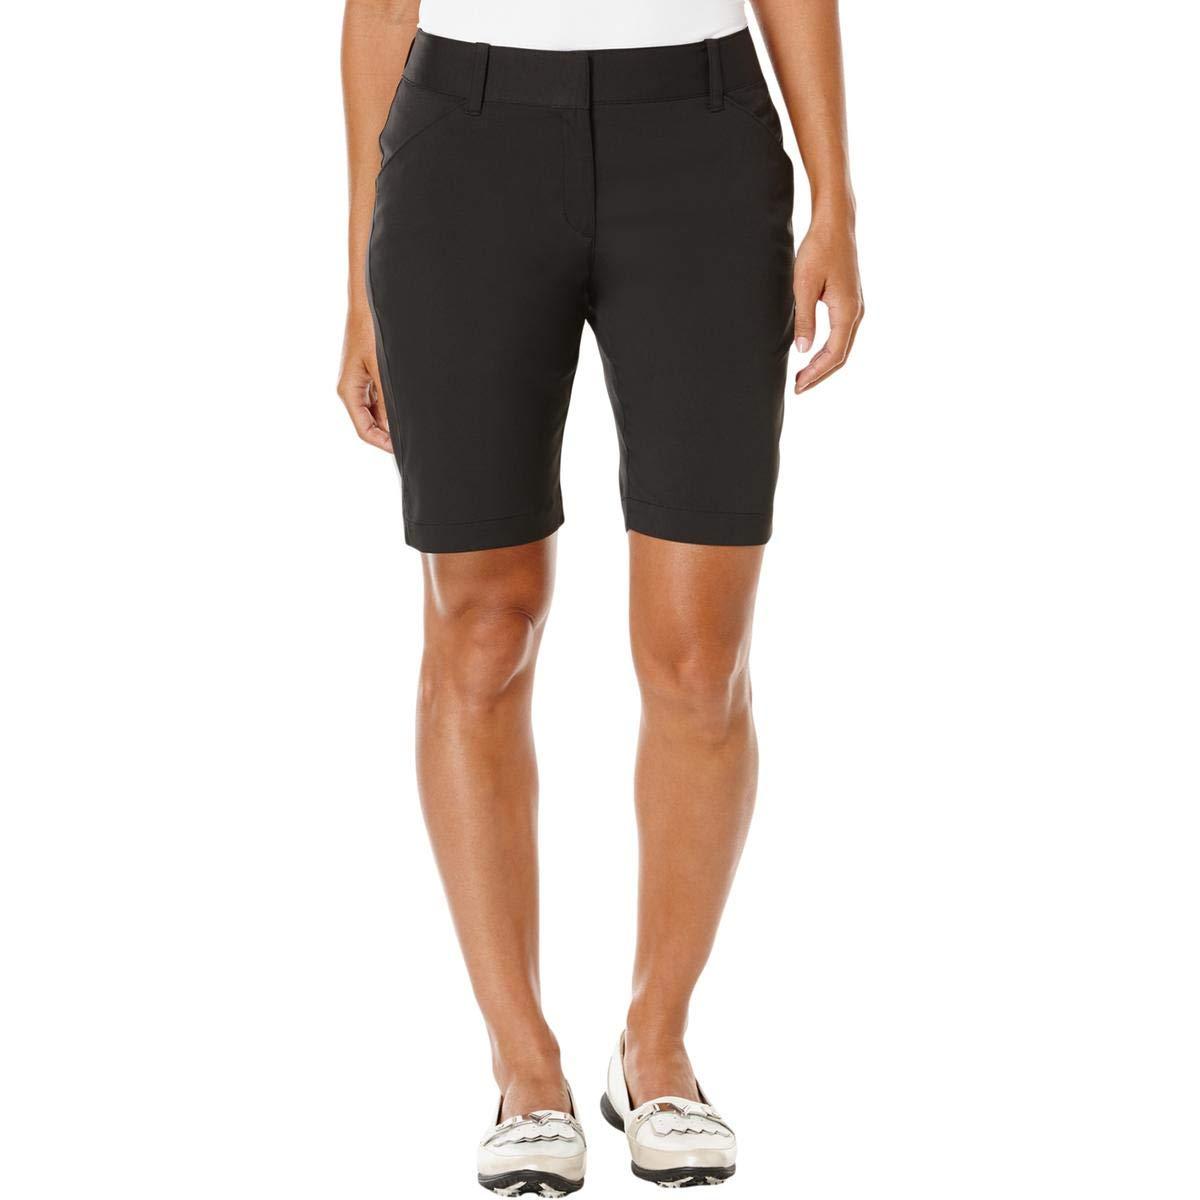 Callaway Women's Golf Performance 19'' Woven Shorts, Caviar, Size 6 by Callaway